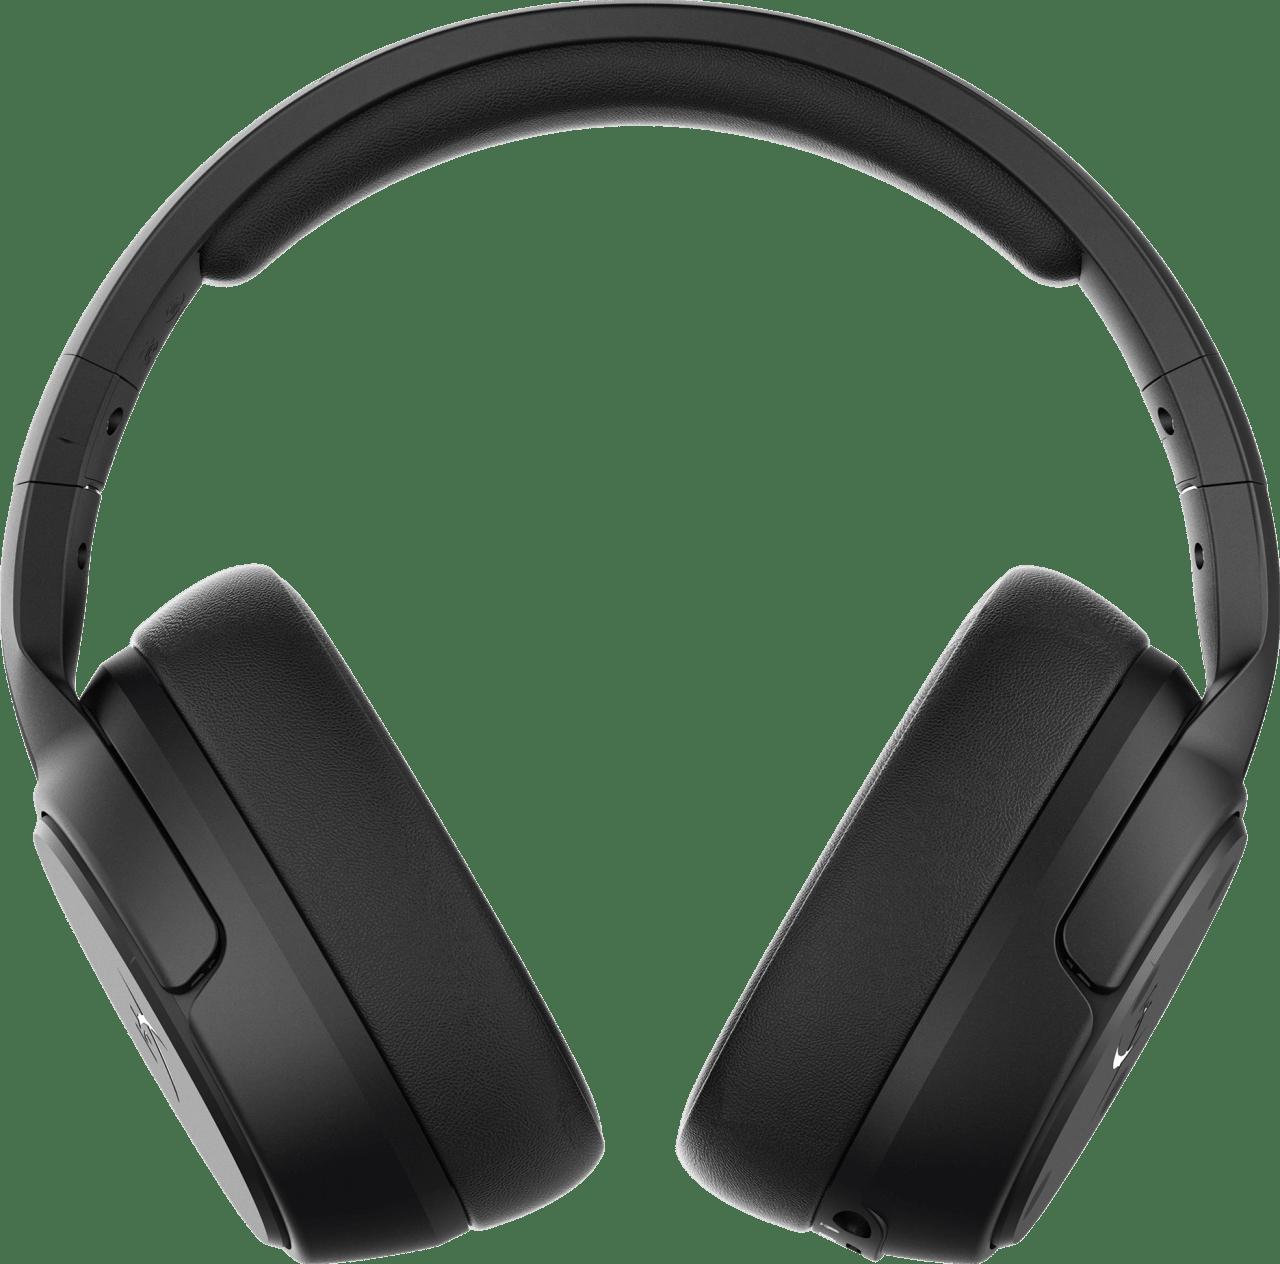 Schwarz HyperX Cloud Flight S Over-Ear-Gaming-Kopfhörer.3